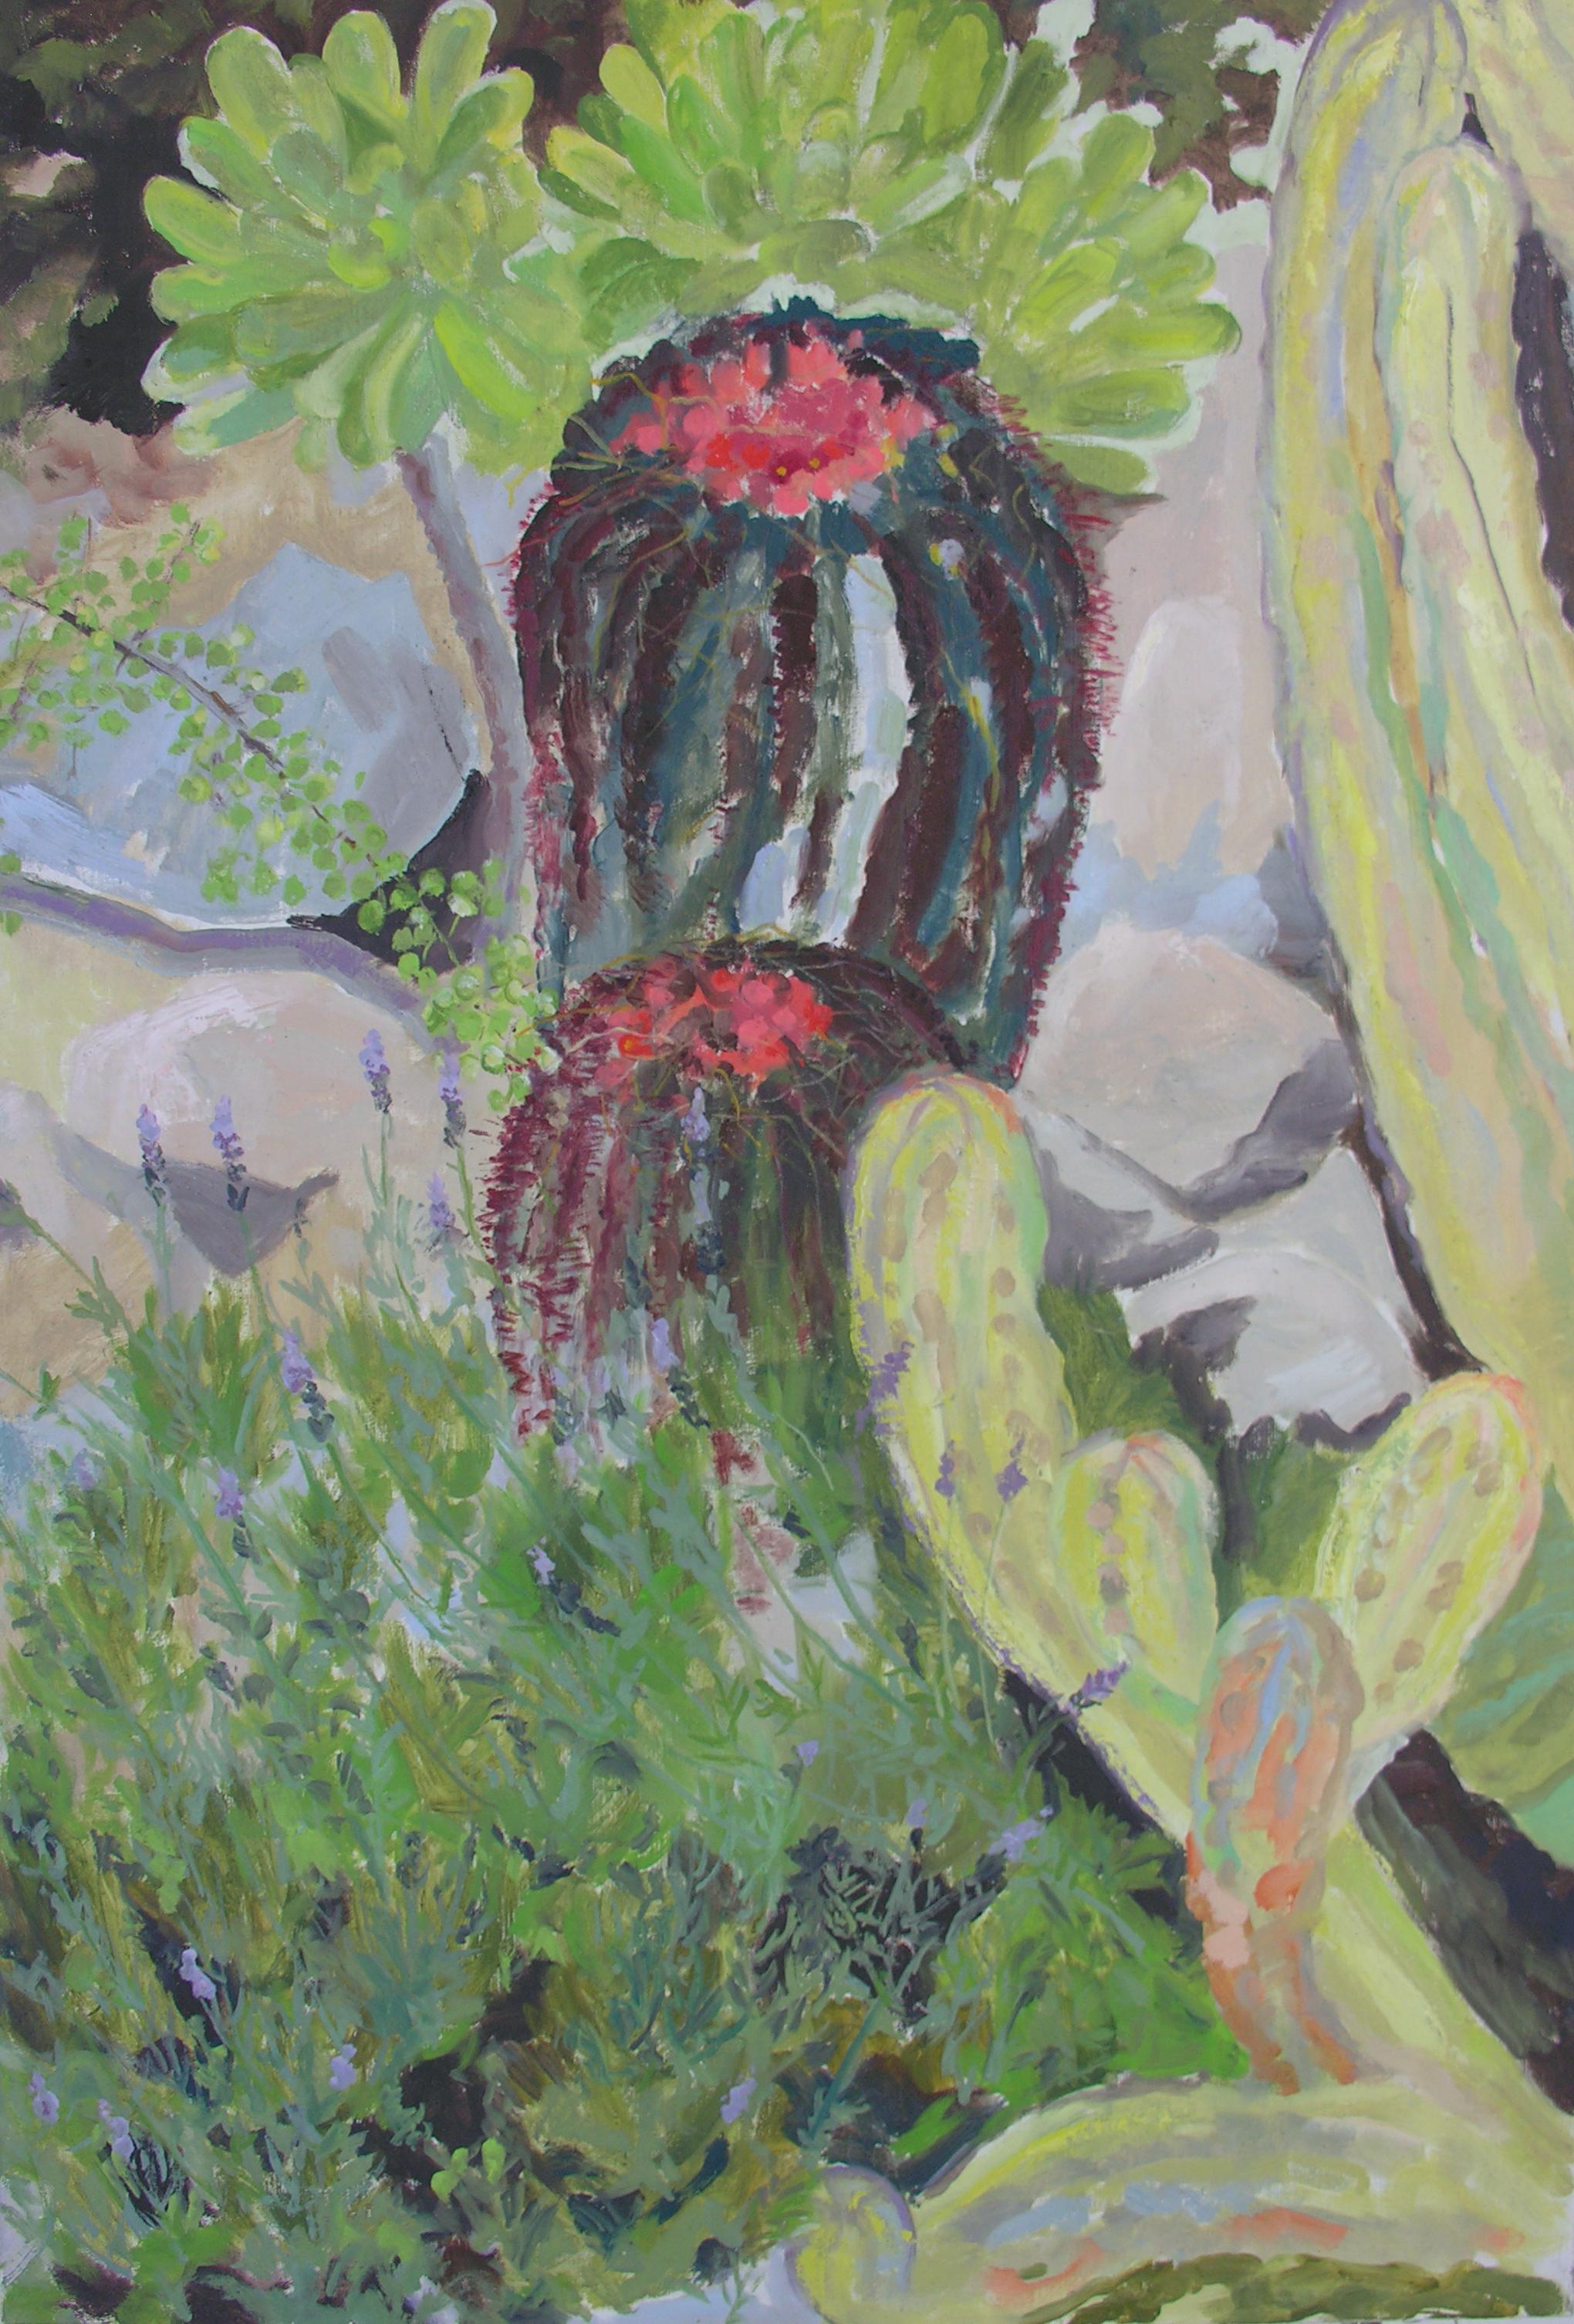 Image of - Ferocactus, Myrtillocactus & Lavander